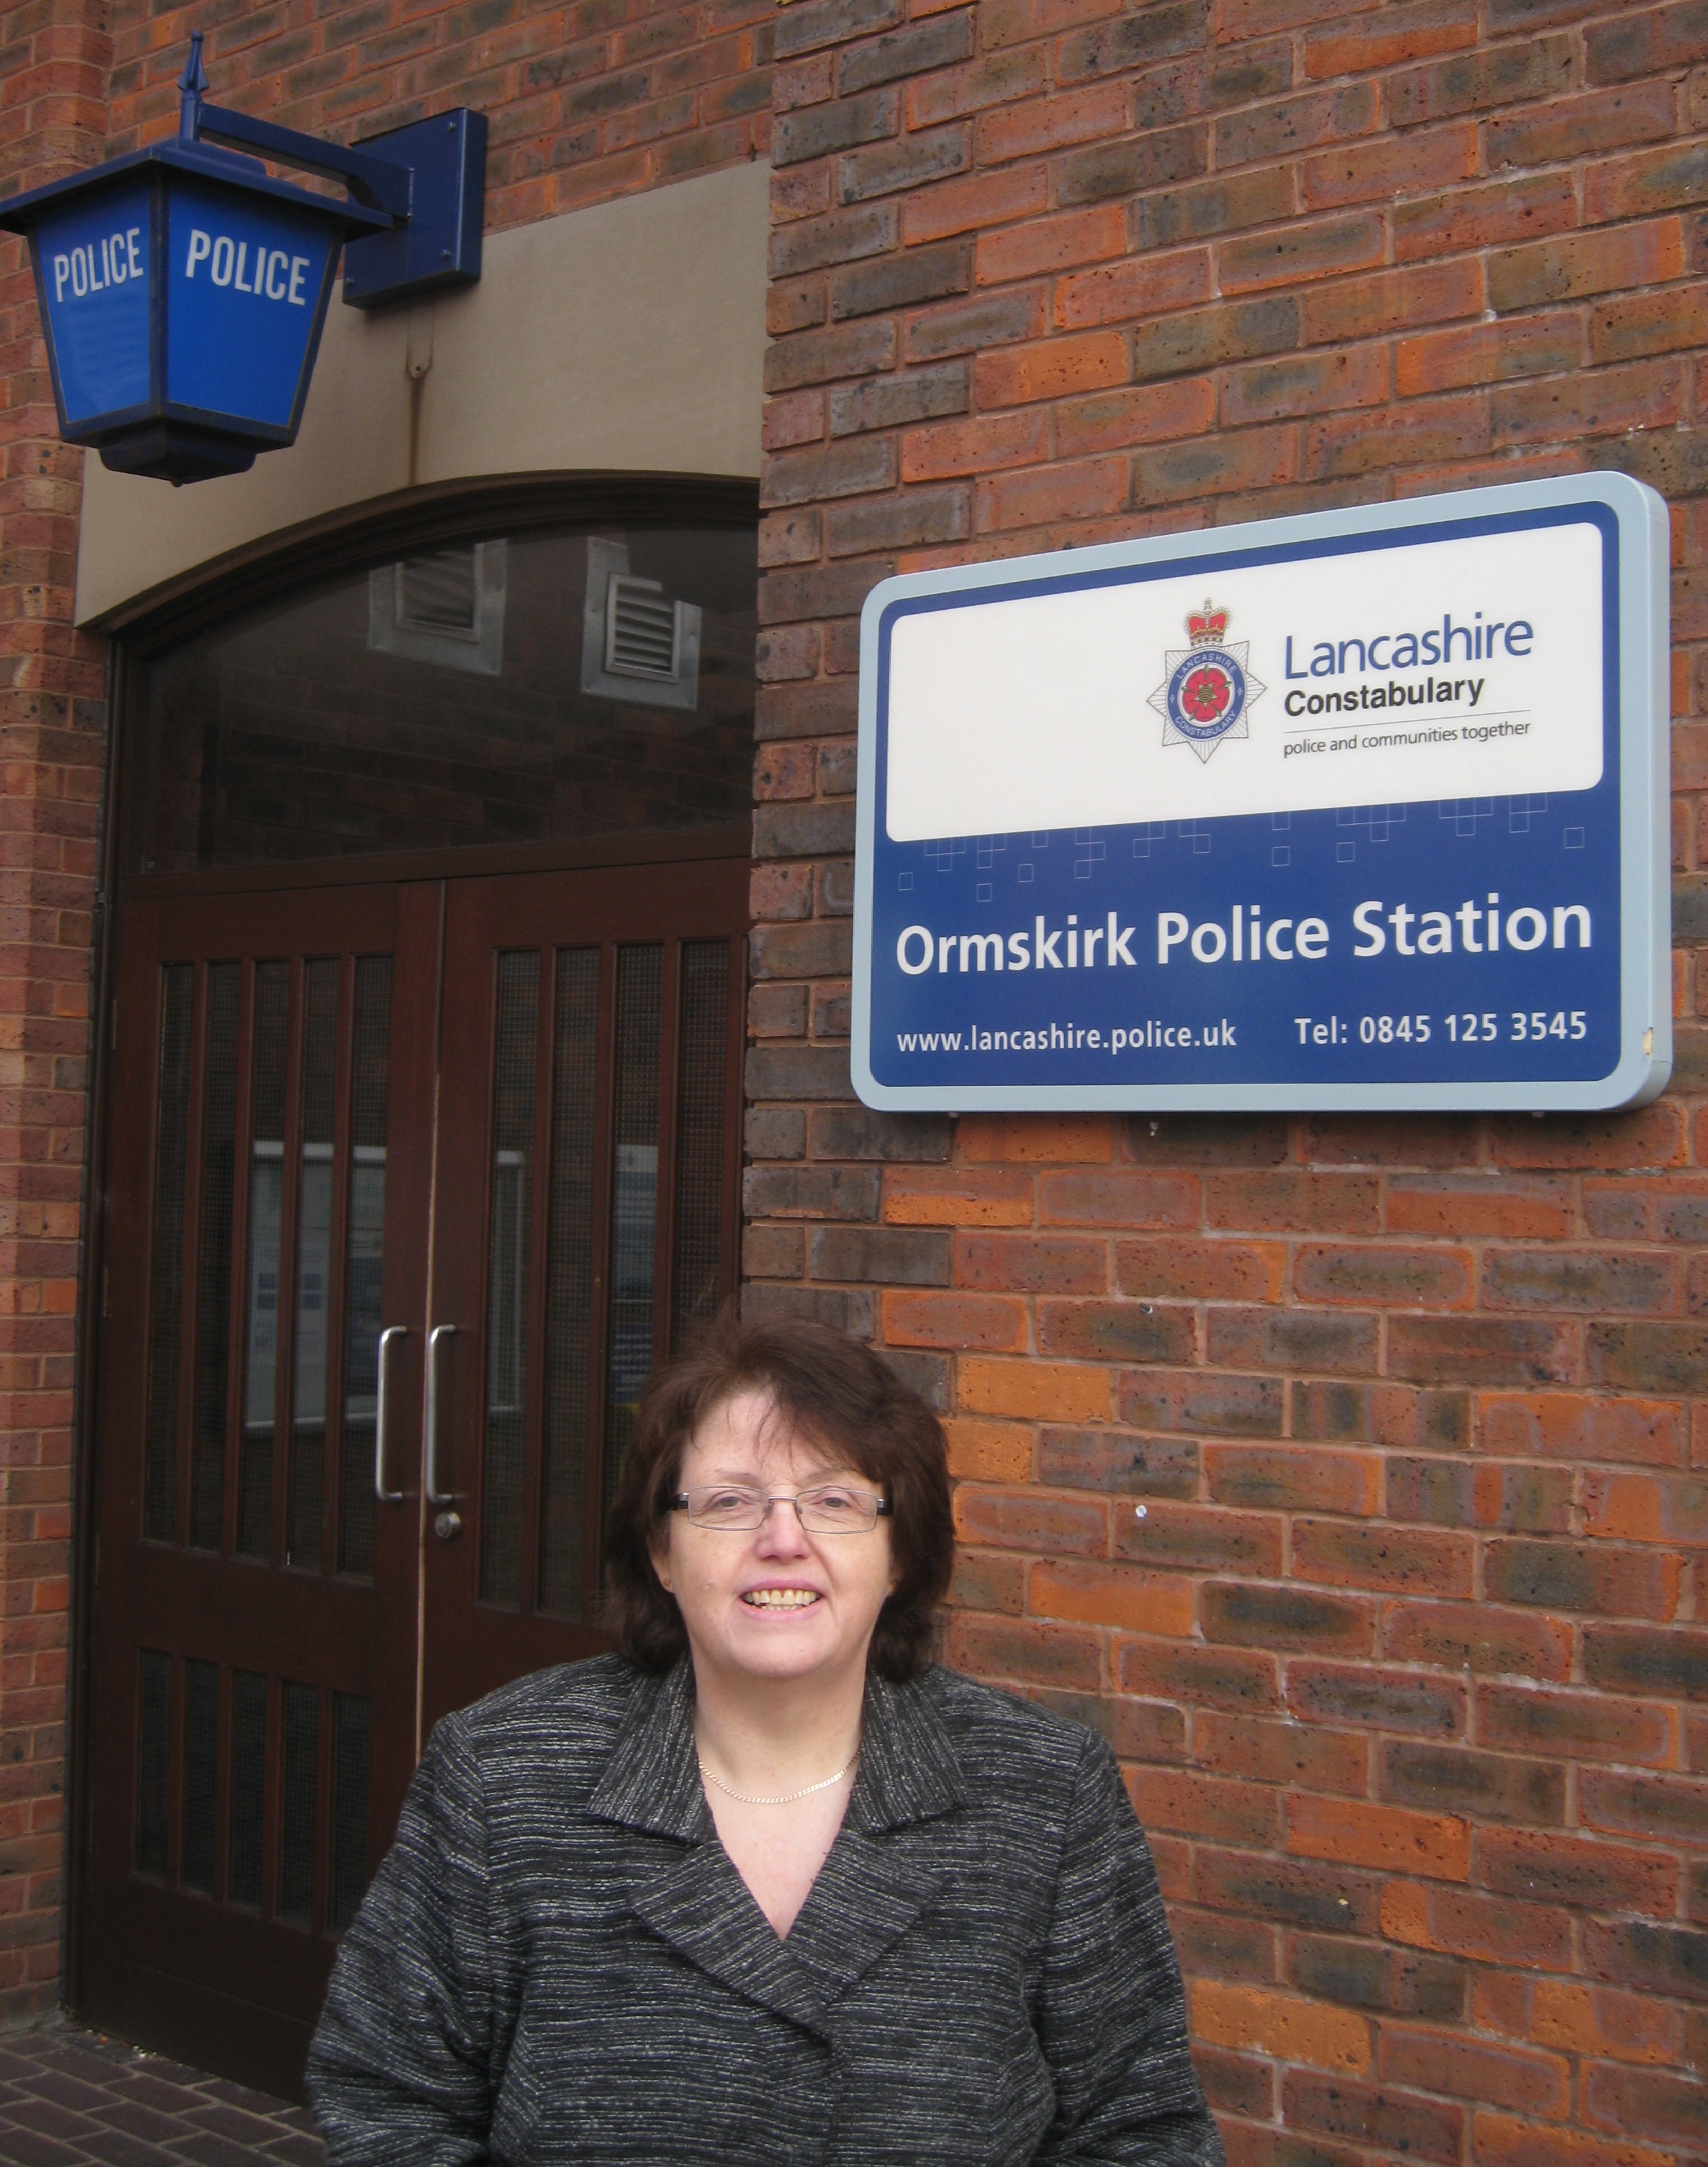 RC_Ormskirk_Police_Station.jpg